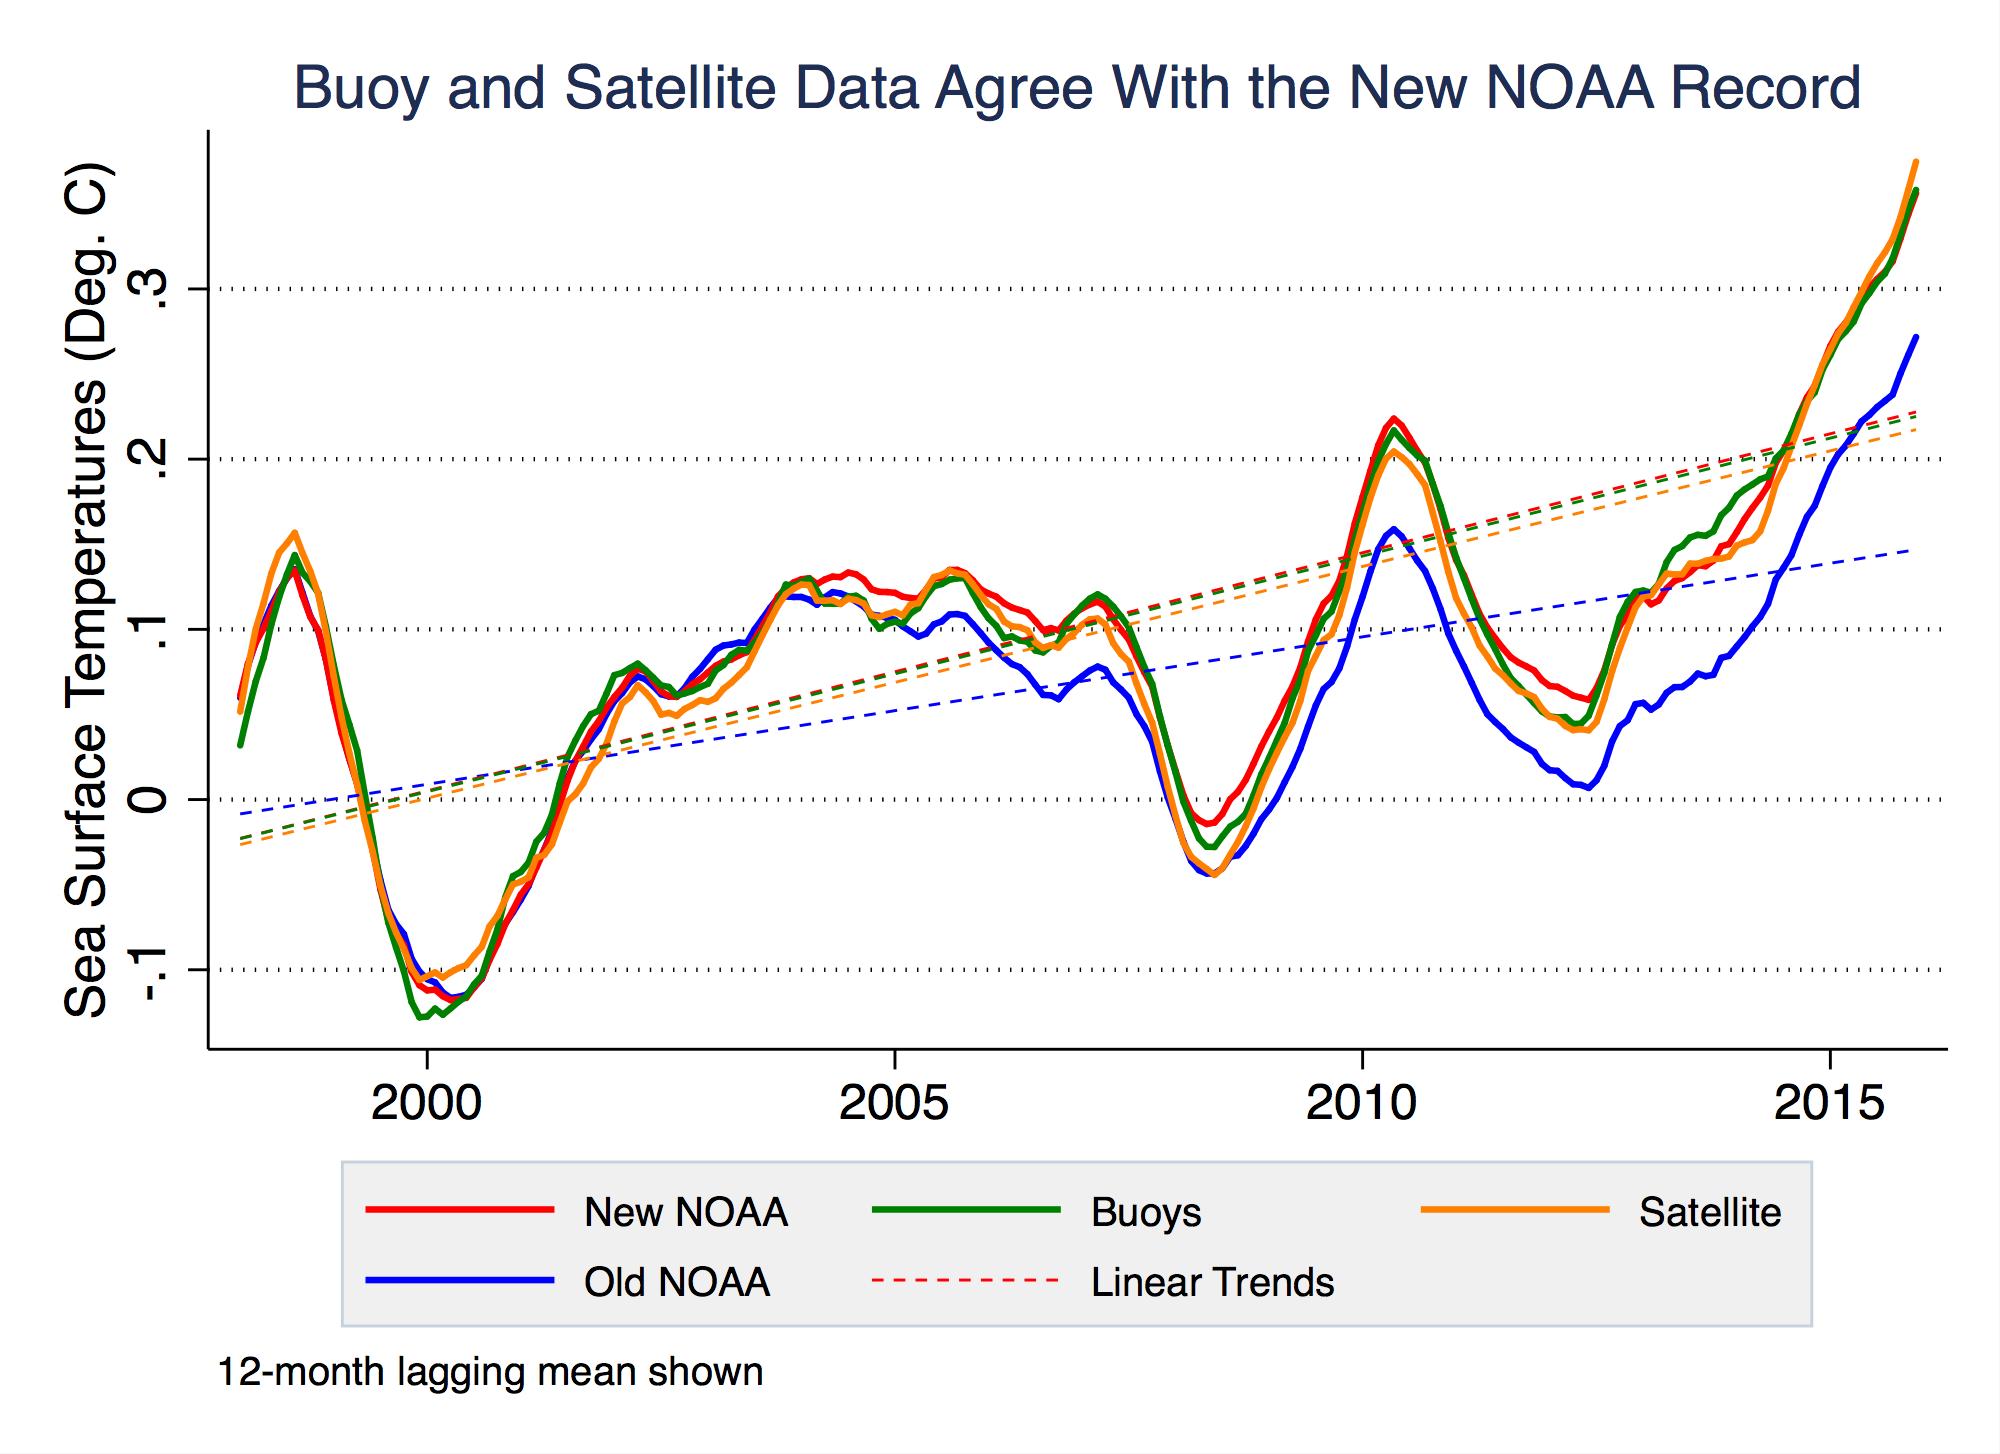 Comparison of Berkeley and NOAA Data